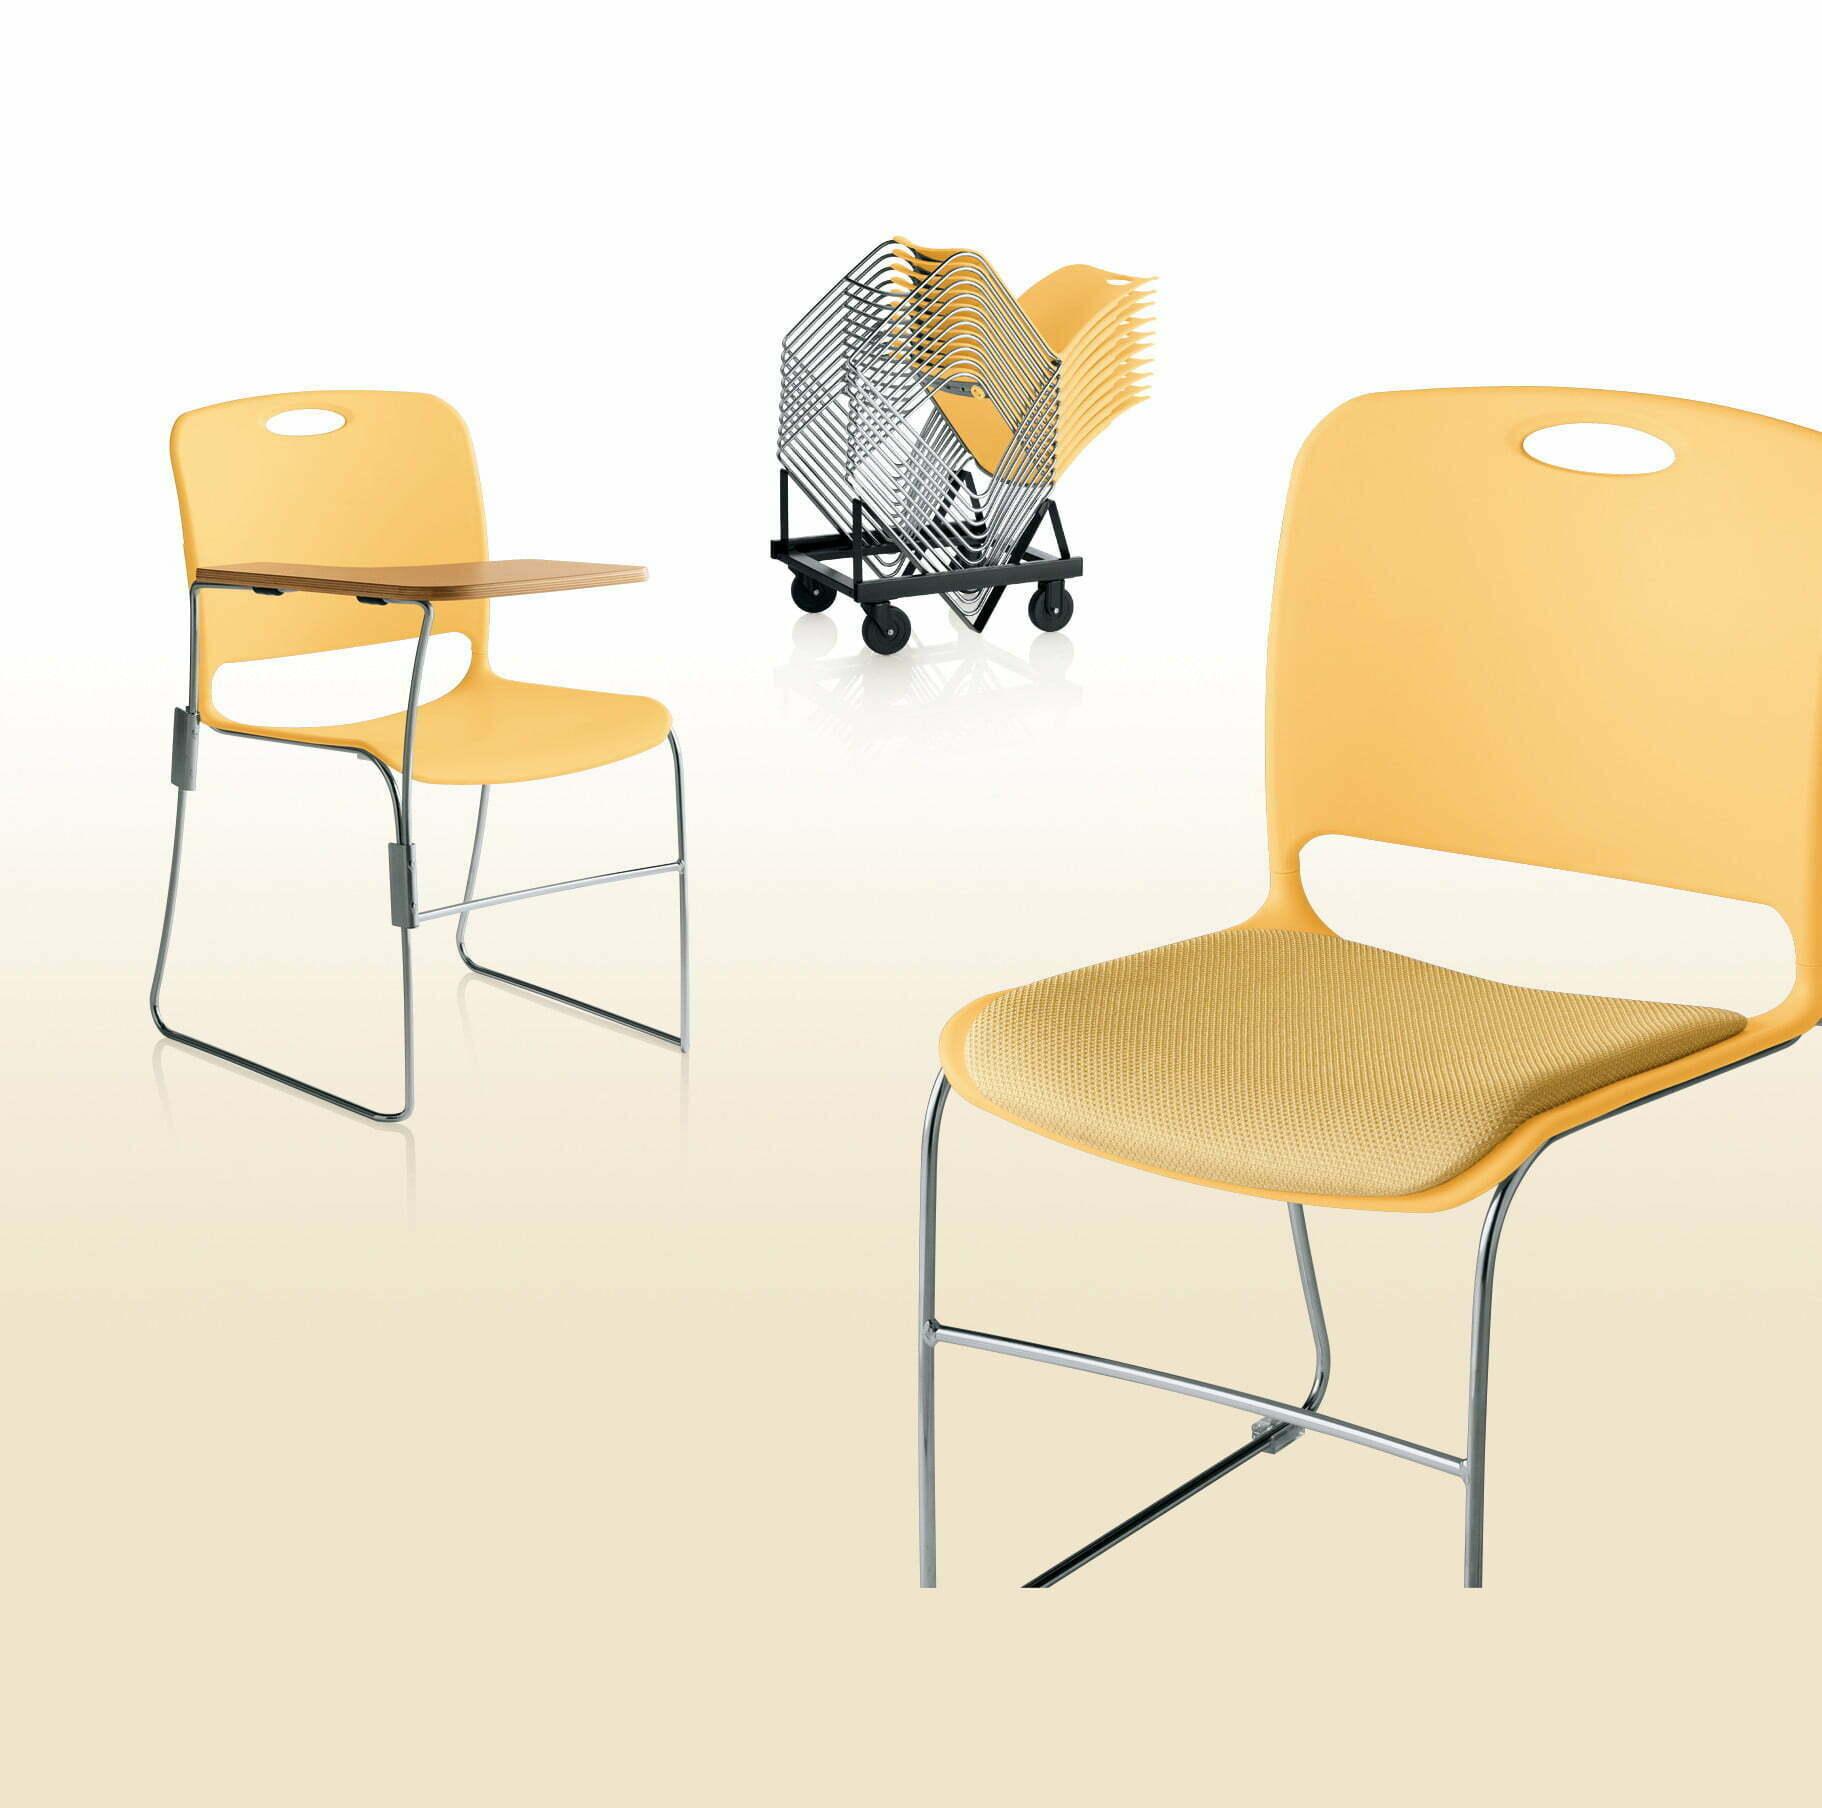 maestro high density stacking chair nortek group